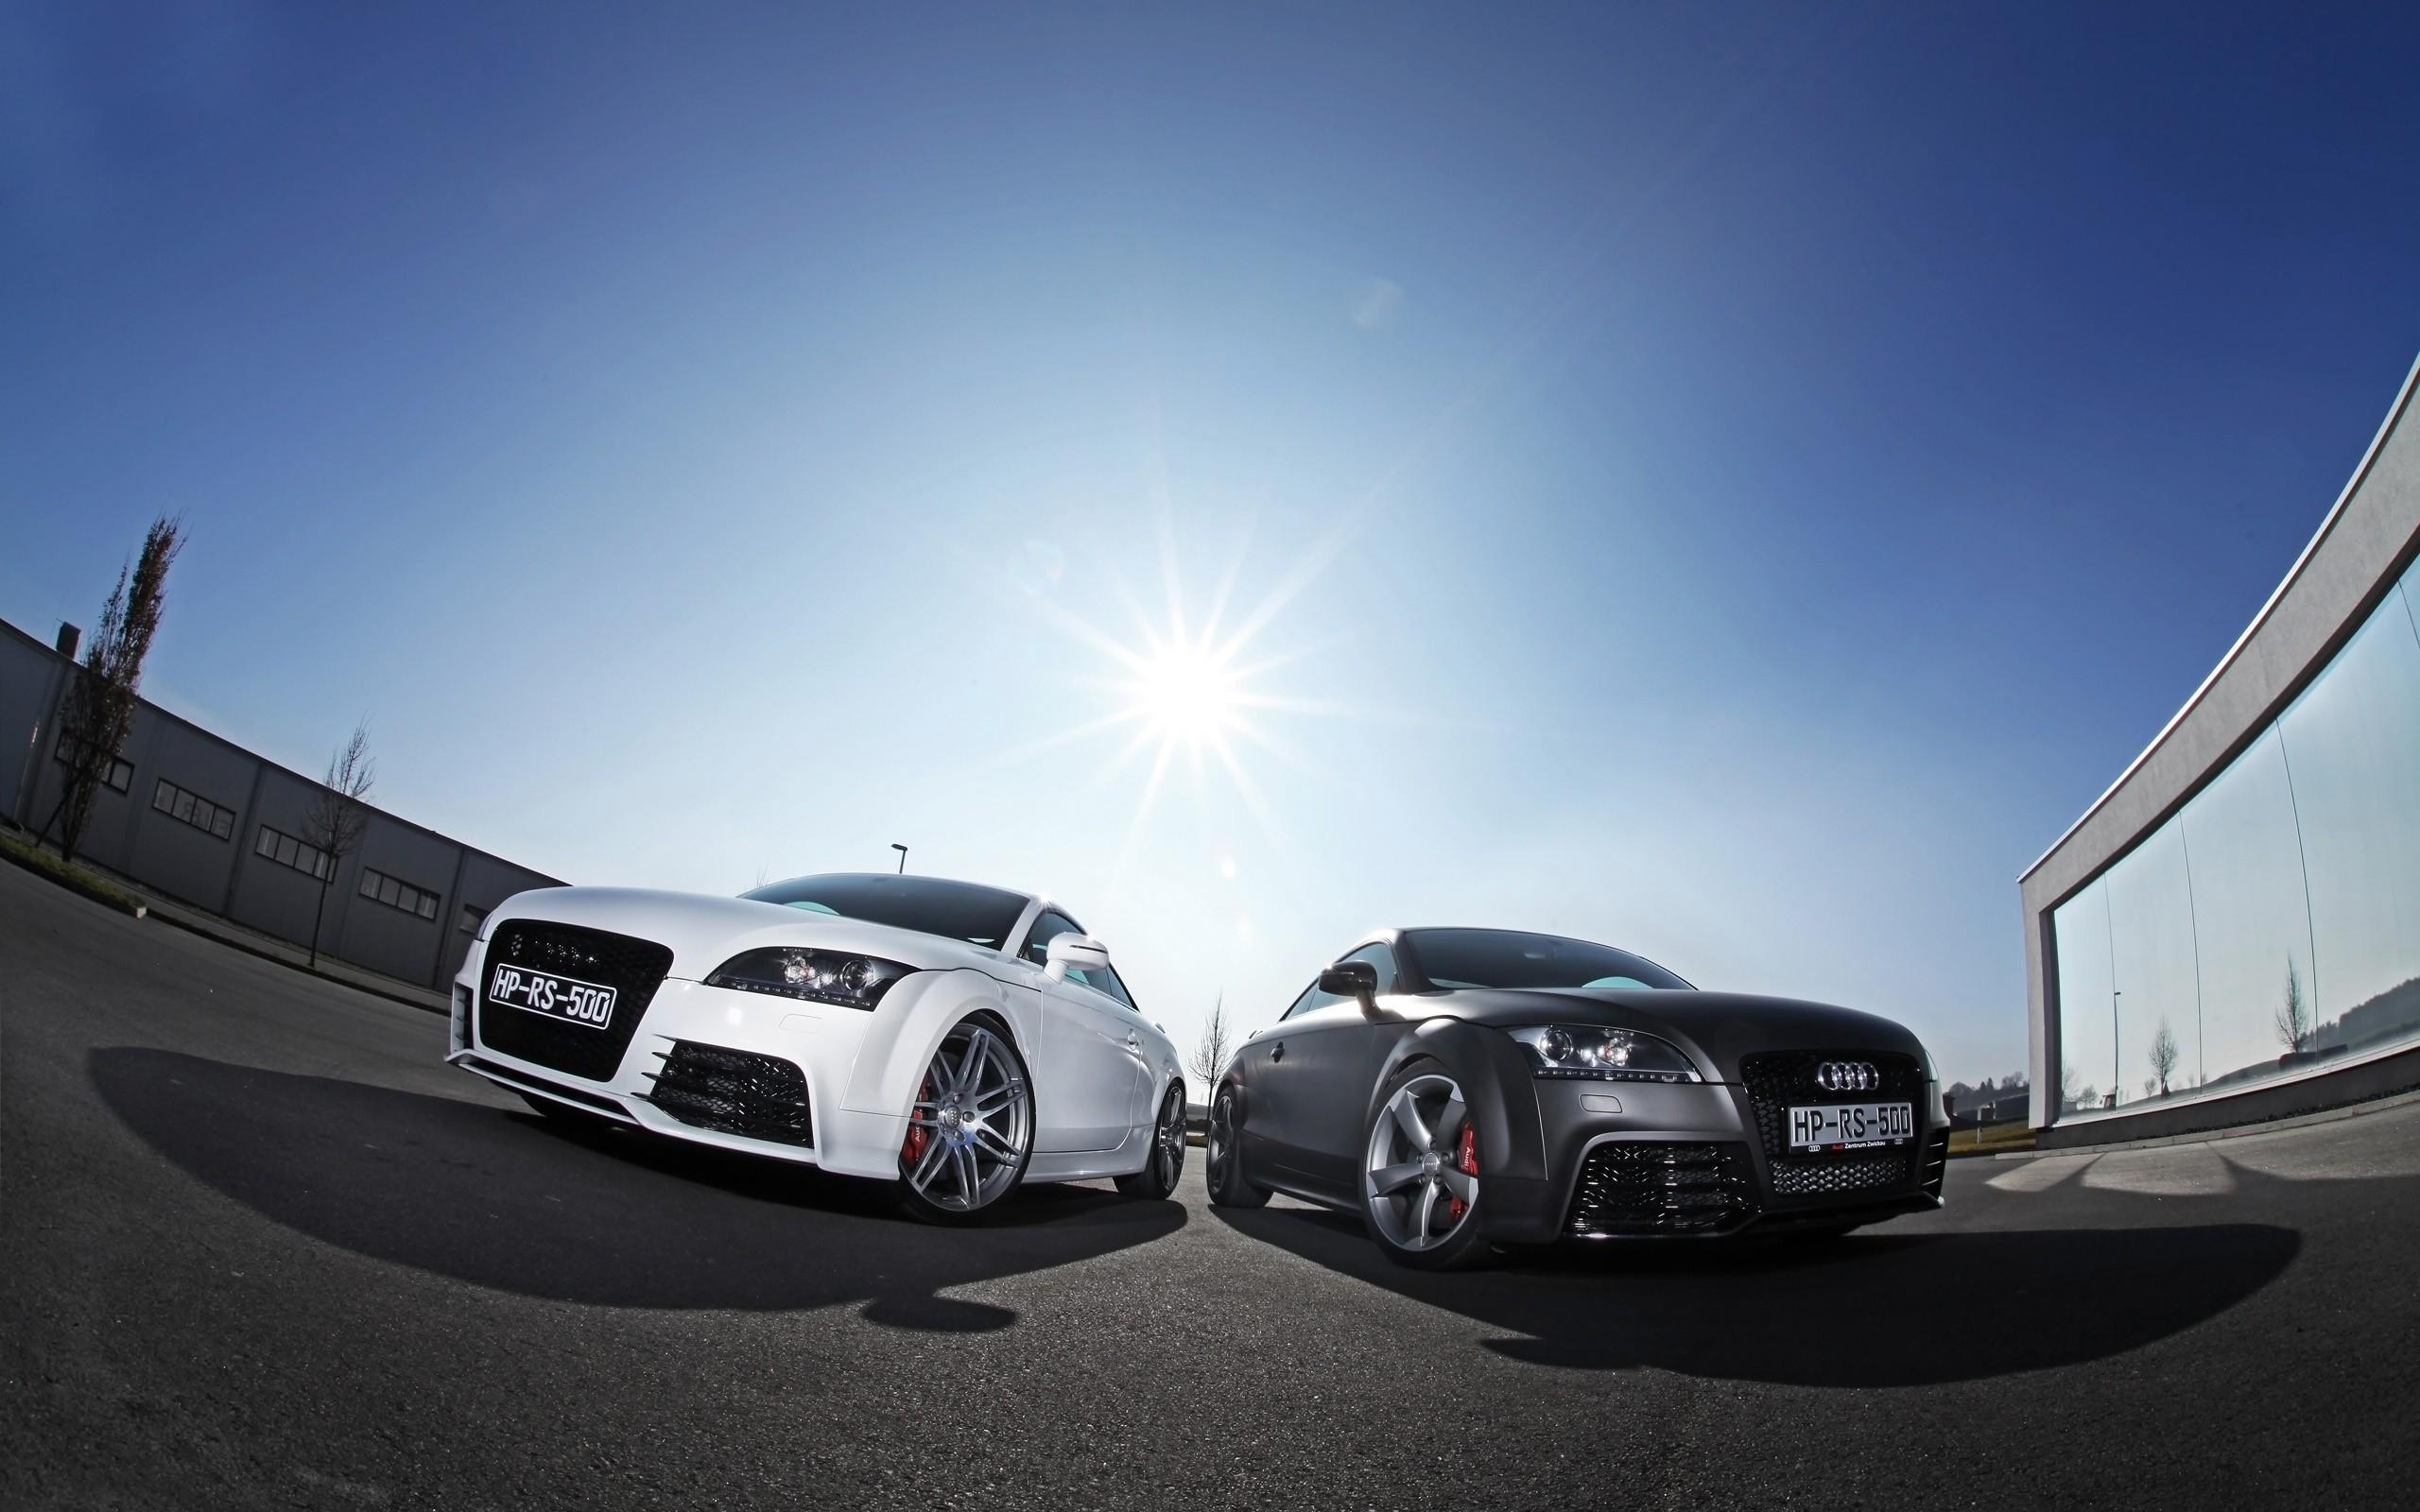 HPerformance Audi TT RS 2014 Wallpaper | HD Car Wallpapers